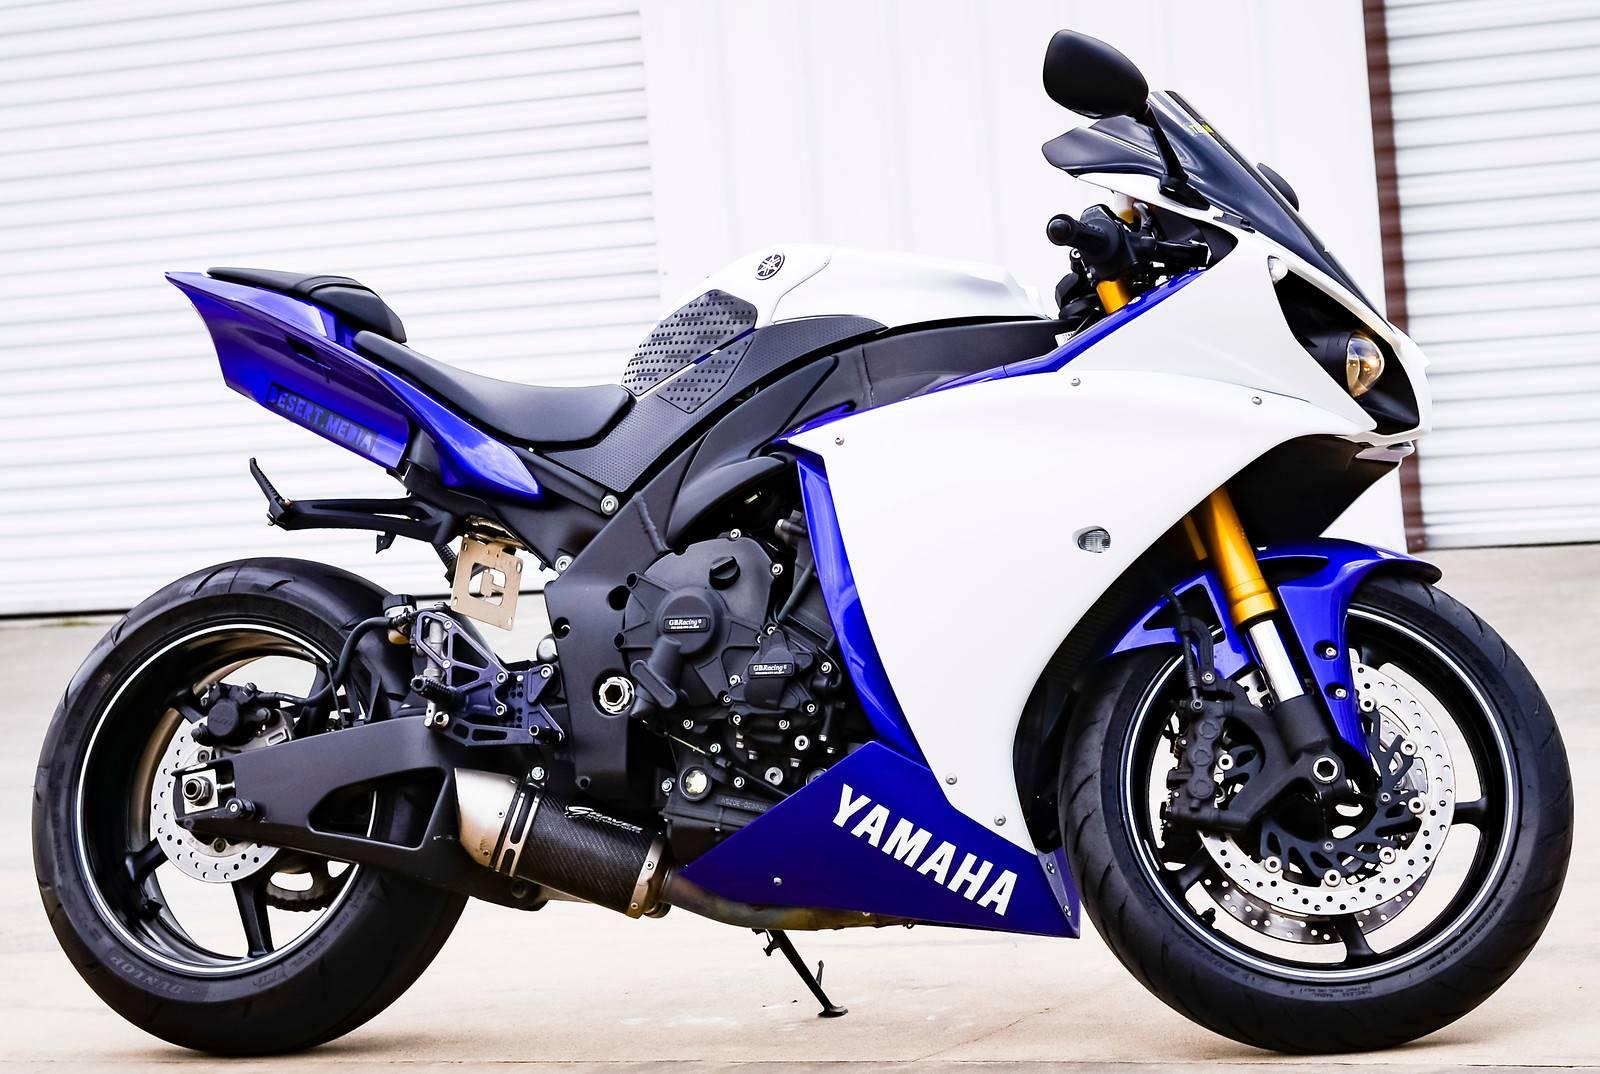 2014 Yamaha YZF-R1 for sale 23902